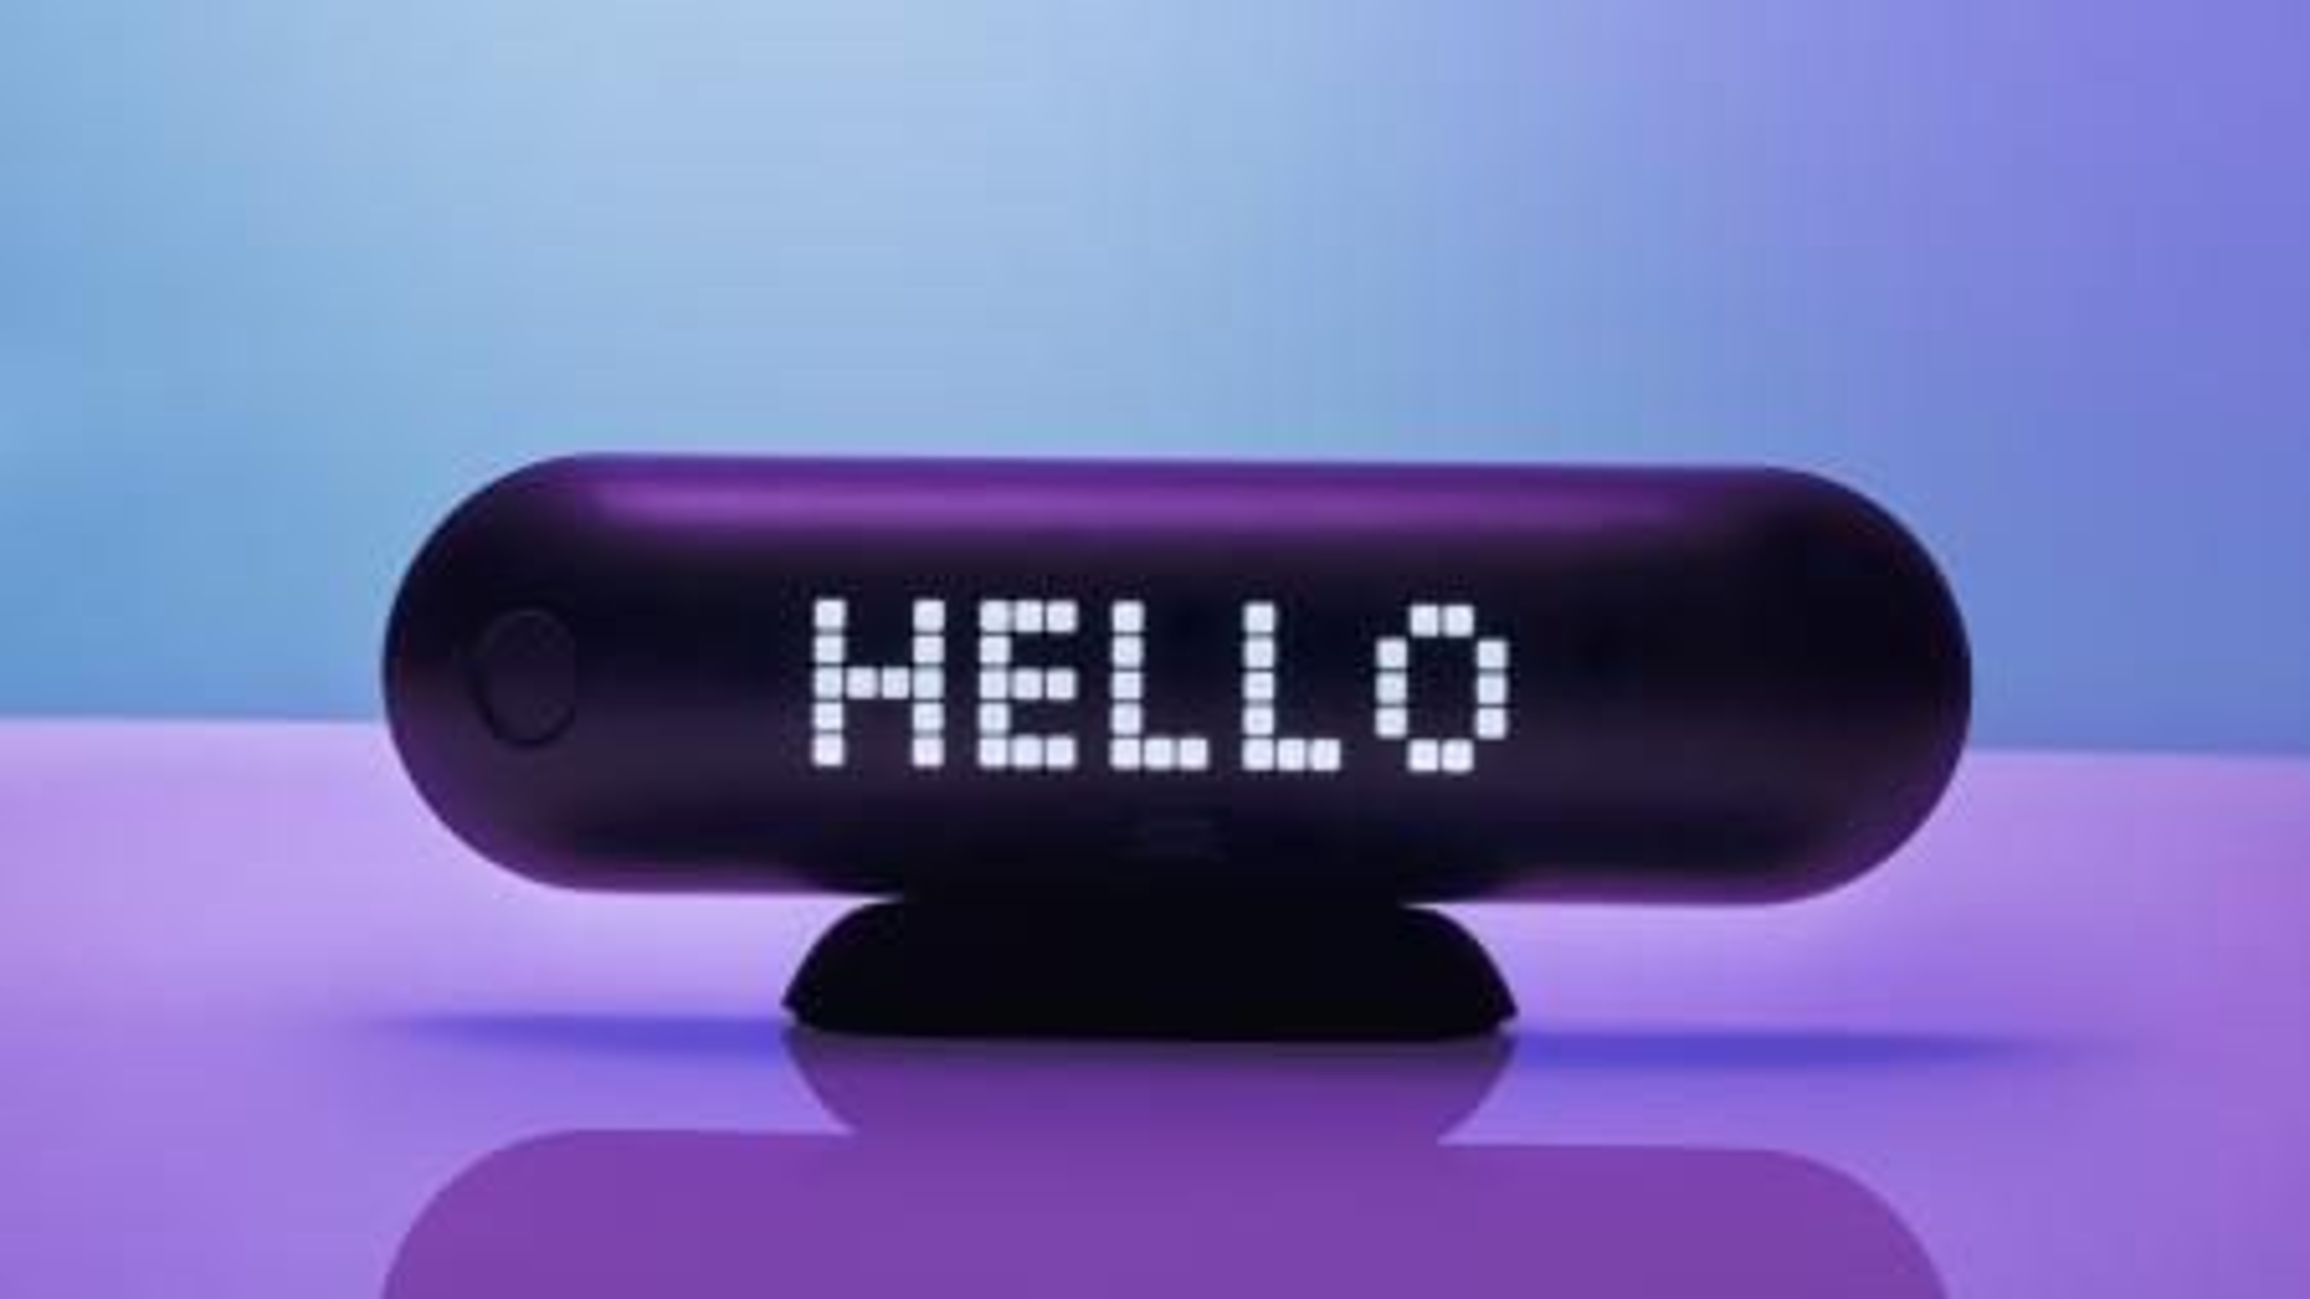 The new Lyft amp